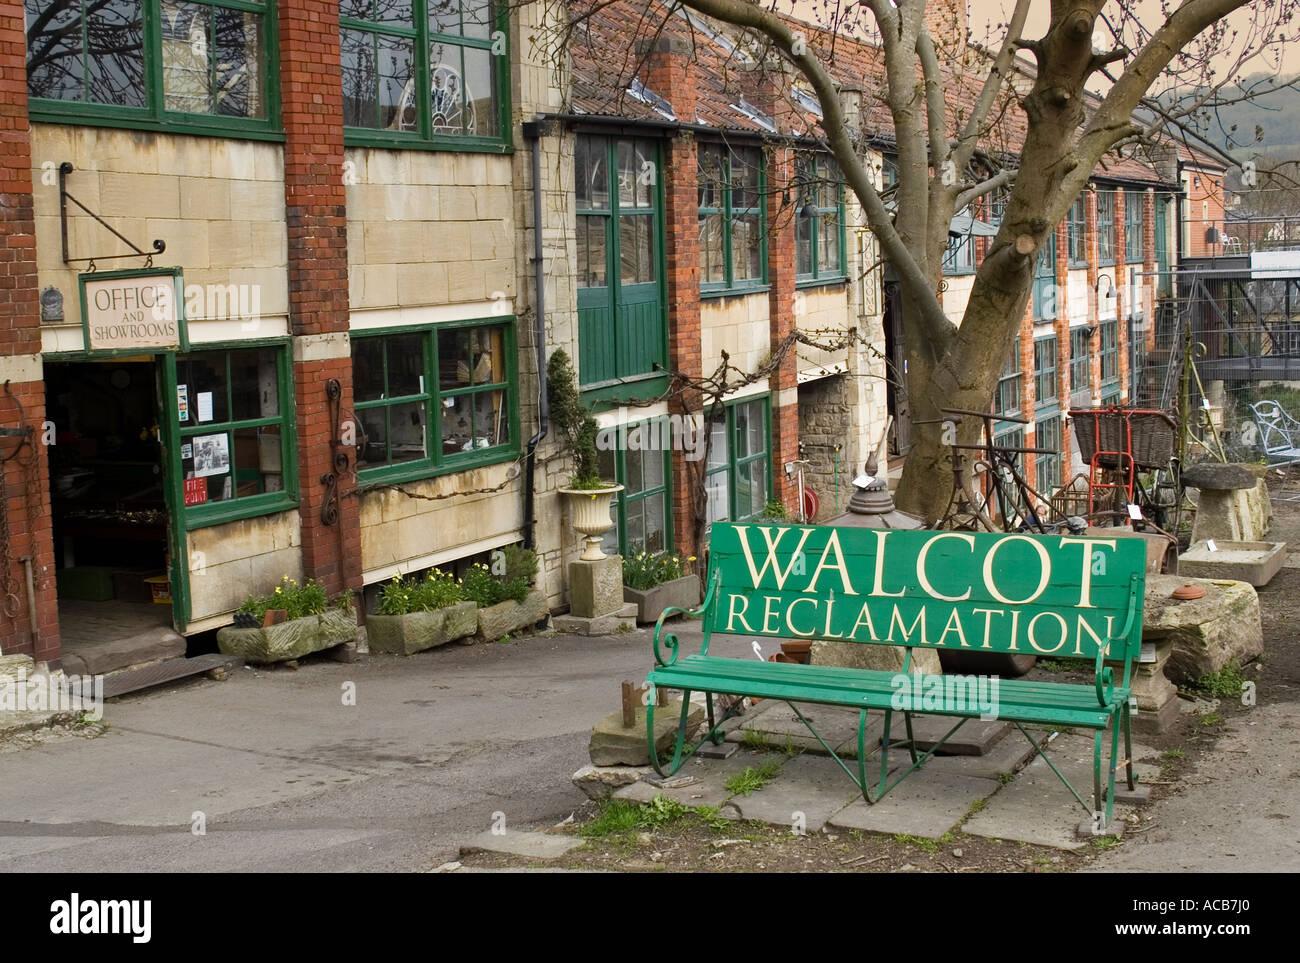 Reclamation yard on Walcot Street BATH England UK Stock Photo ...